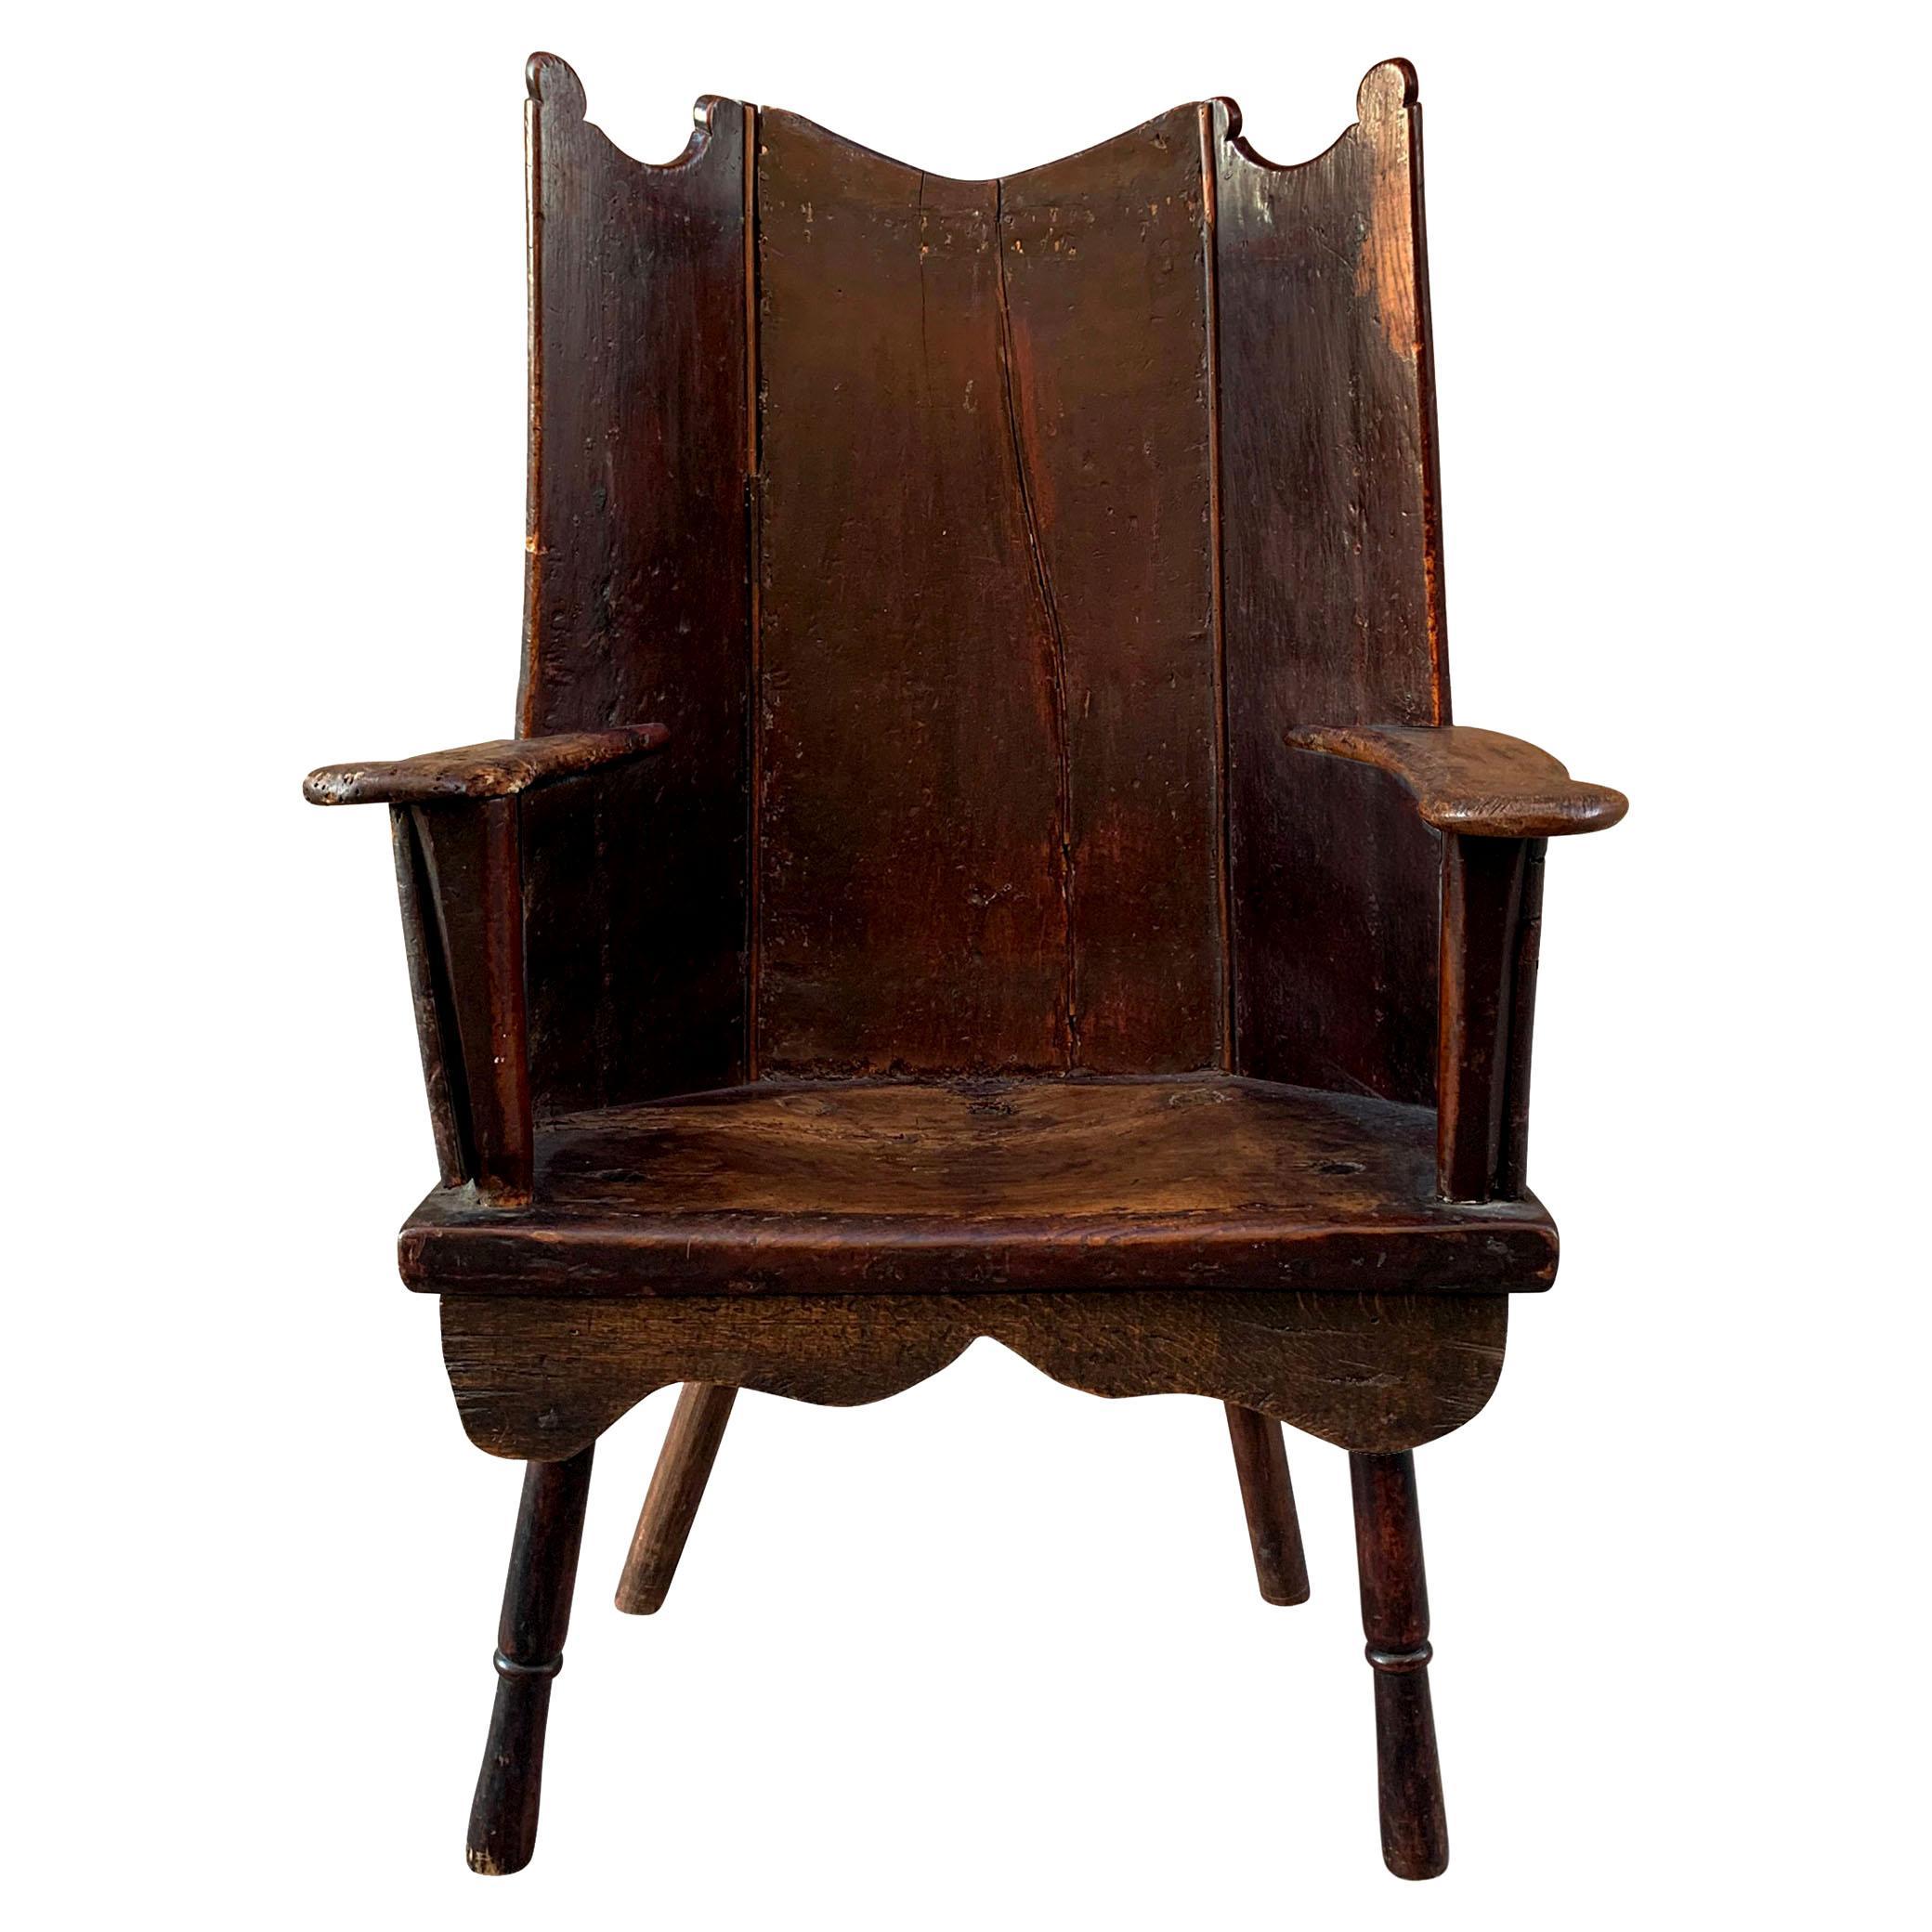 18th Century English Wingback Chair